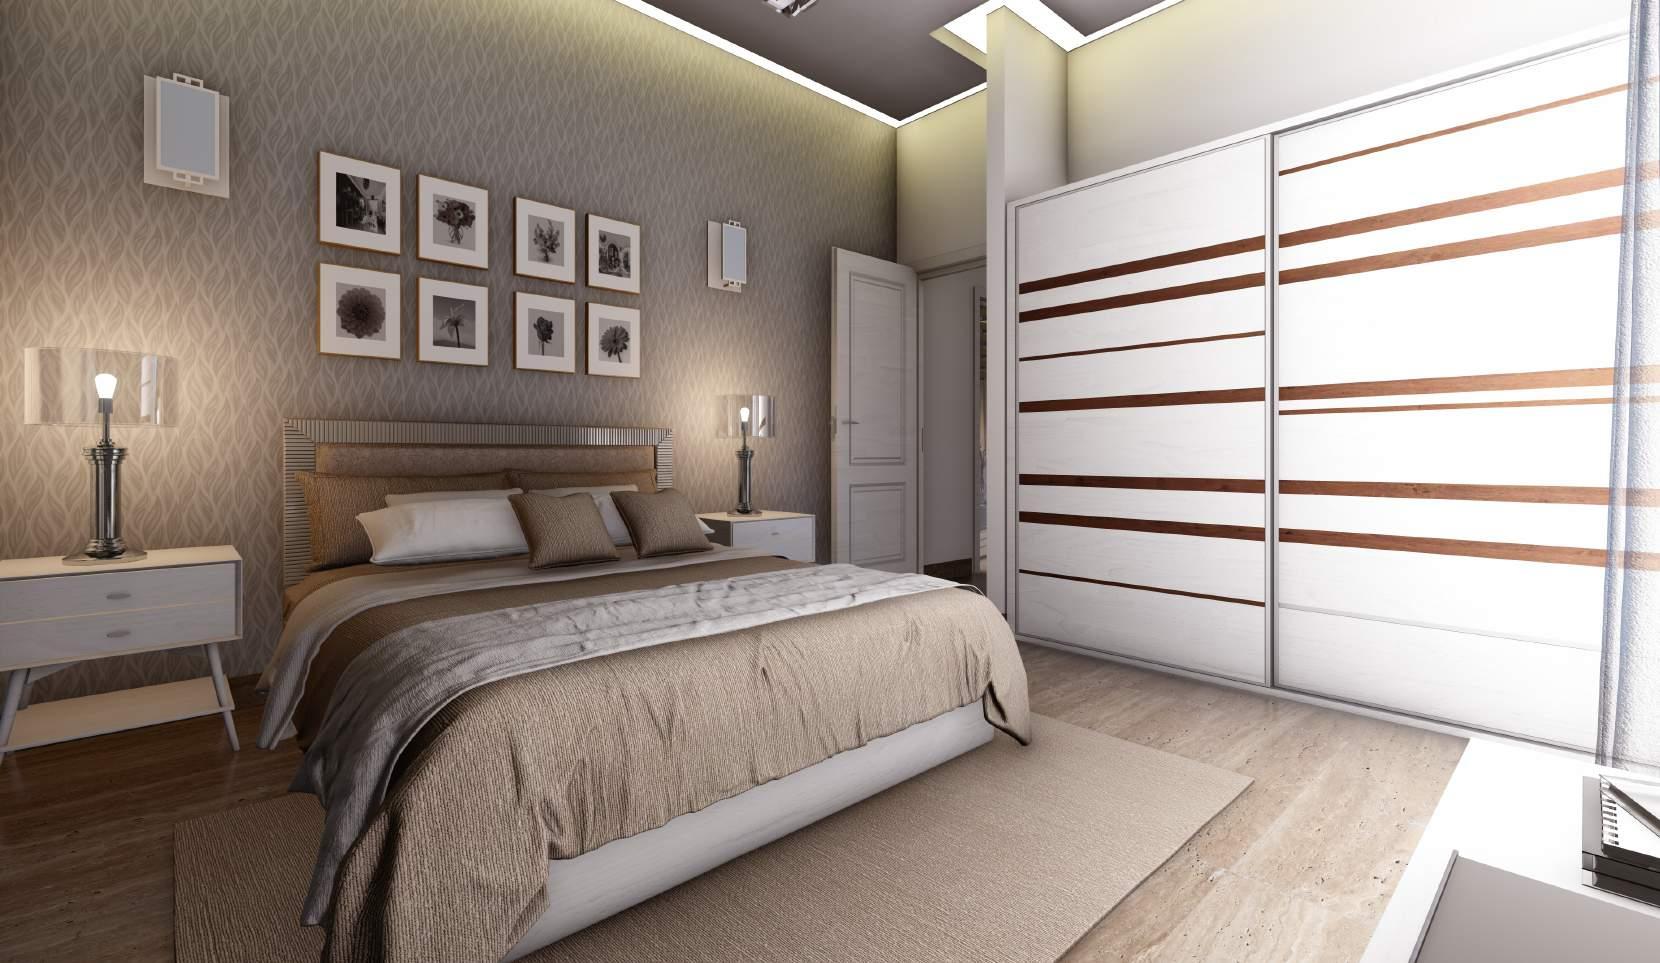 Samana Hills by Samana at Arjan. Luxury apartments for Sale in Dubai